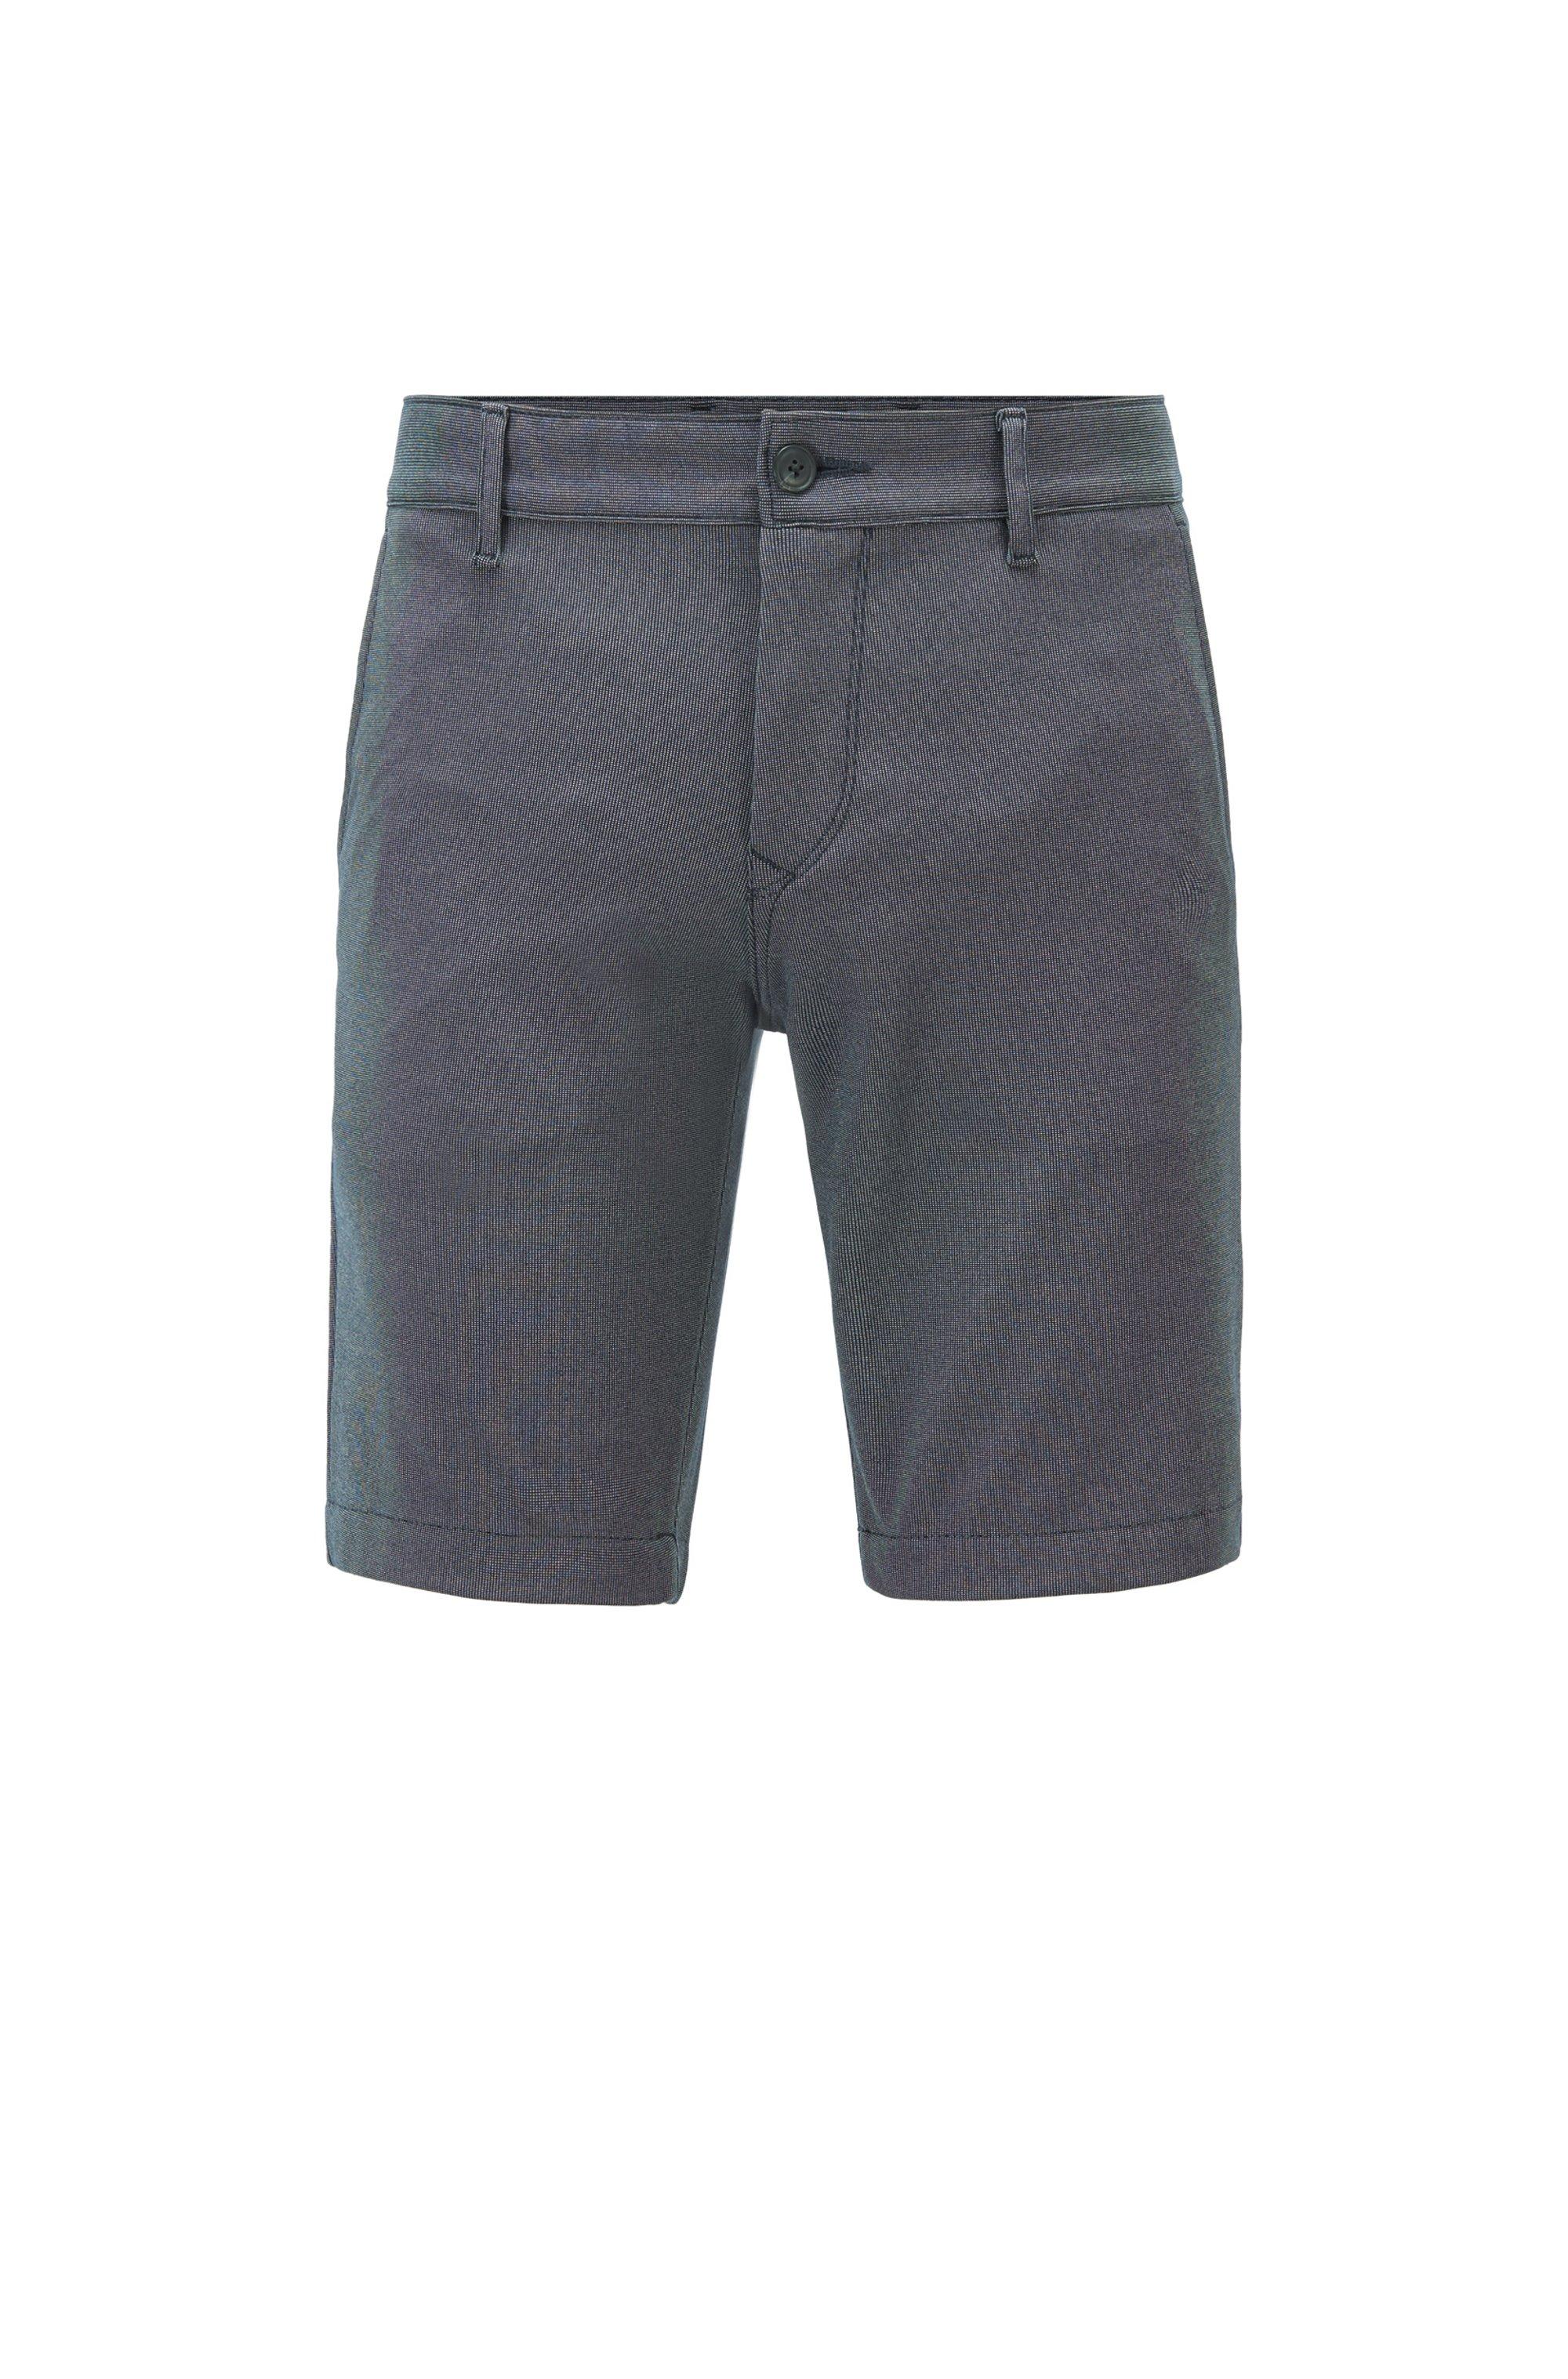 Filigran gemusterte Slim-Fit Shorts aus Stretch-Gewebe, Dunkelblau